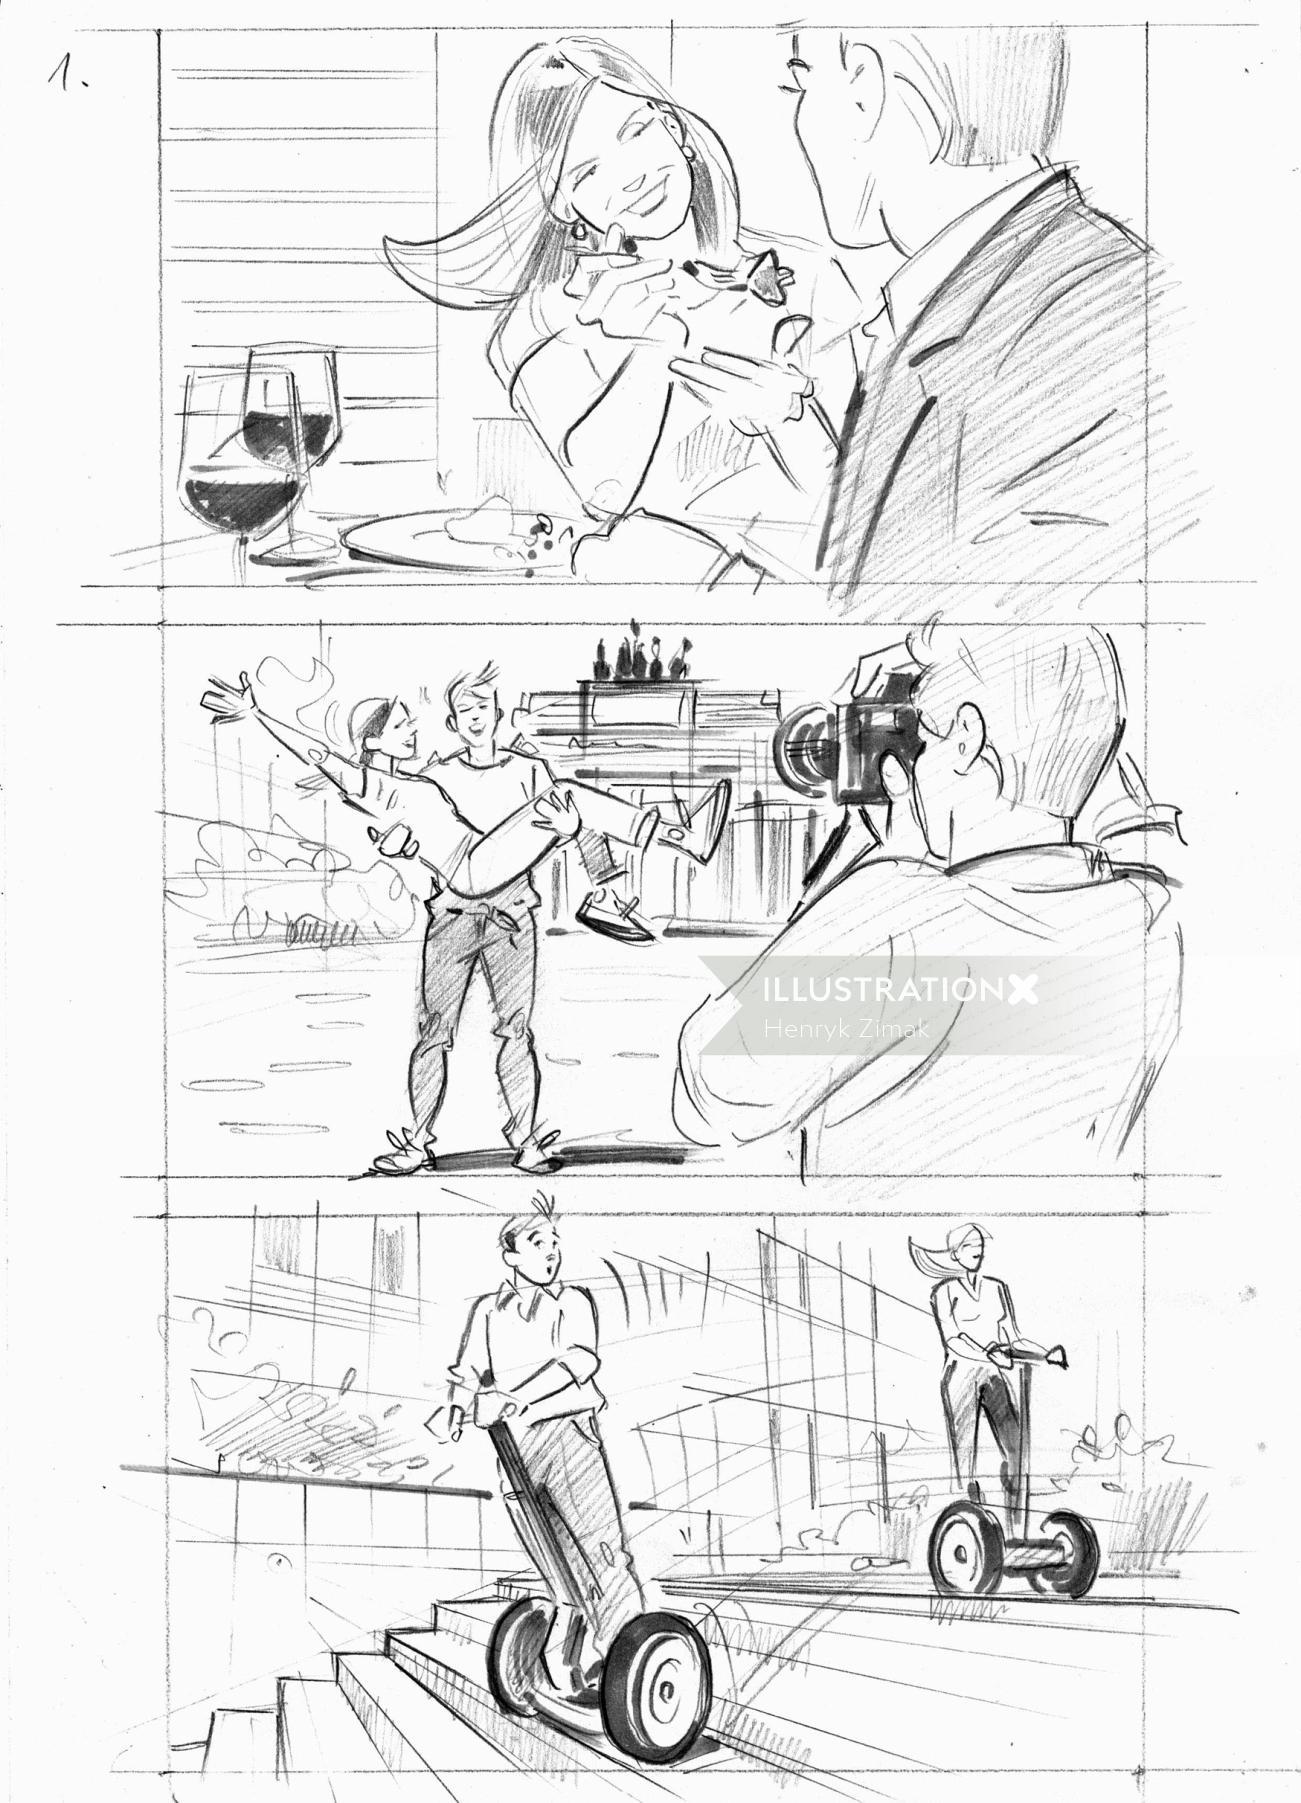 Storyboard illustration of couple vacation